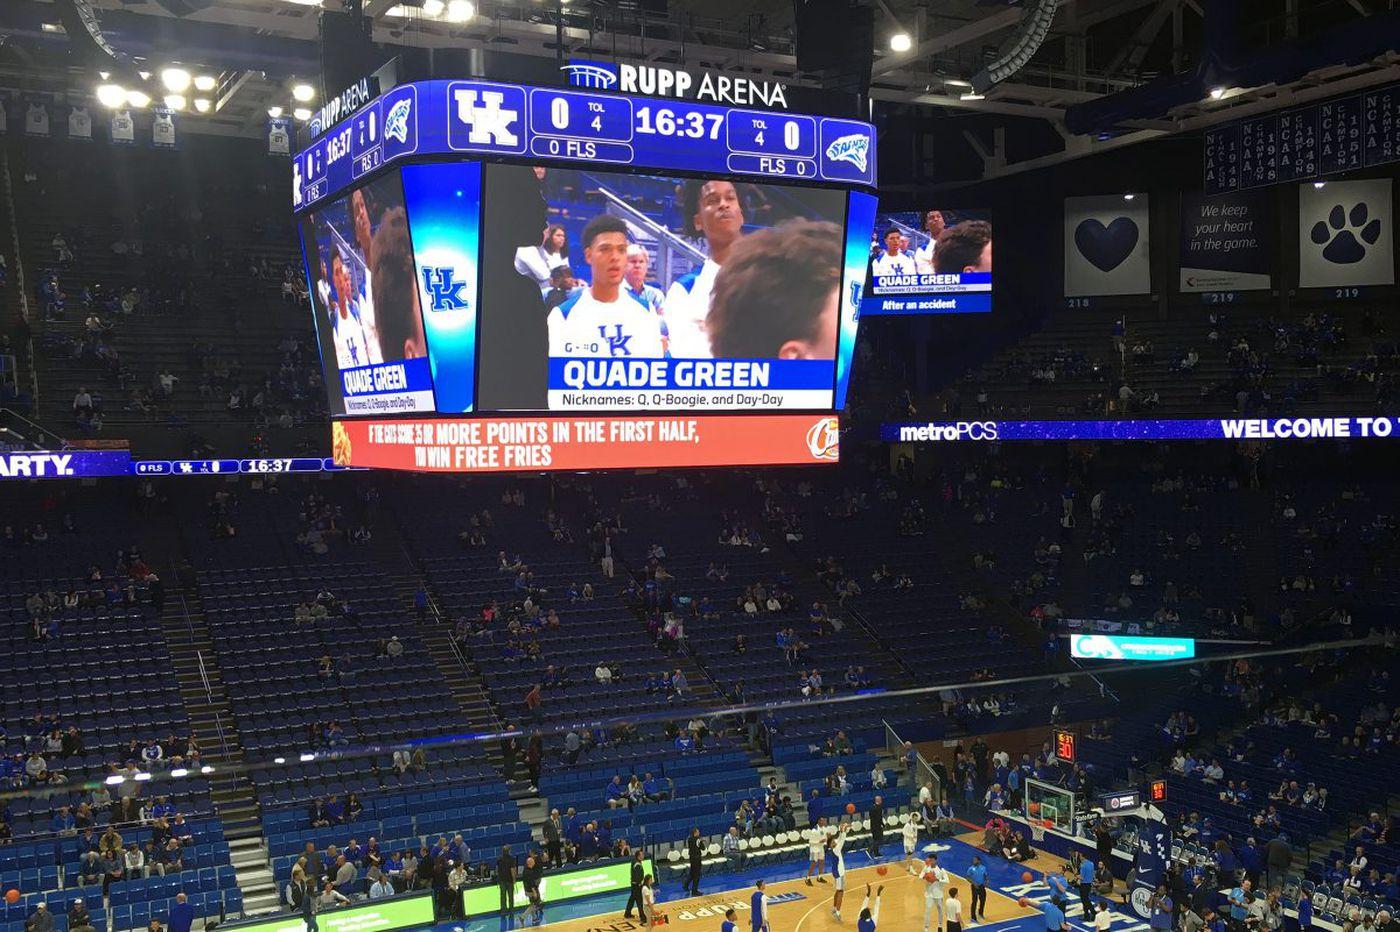 Philly star Quade Green in a big spotlight at Kentucky